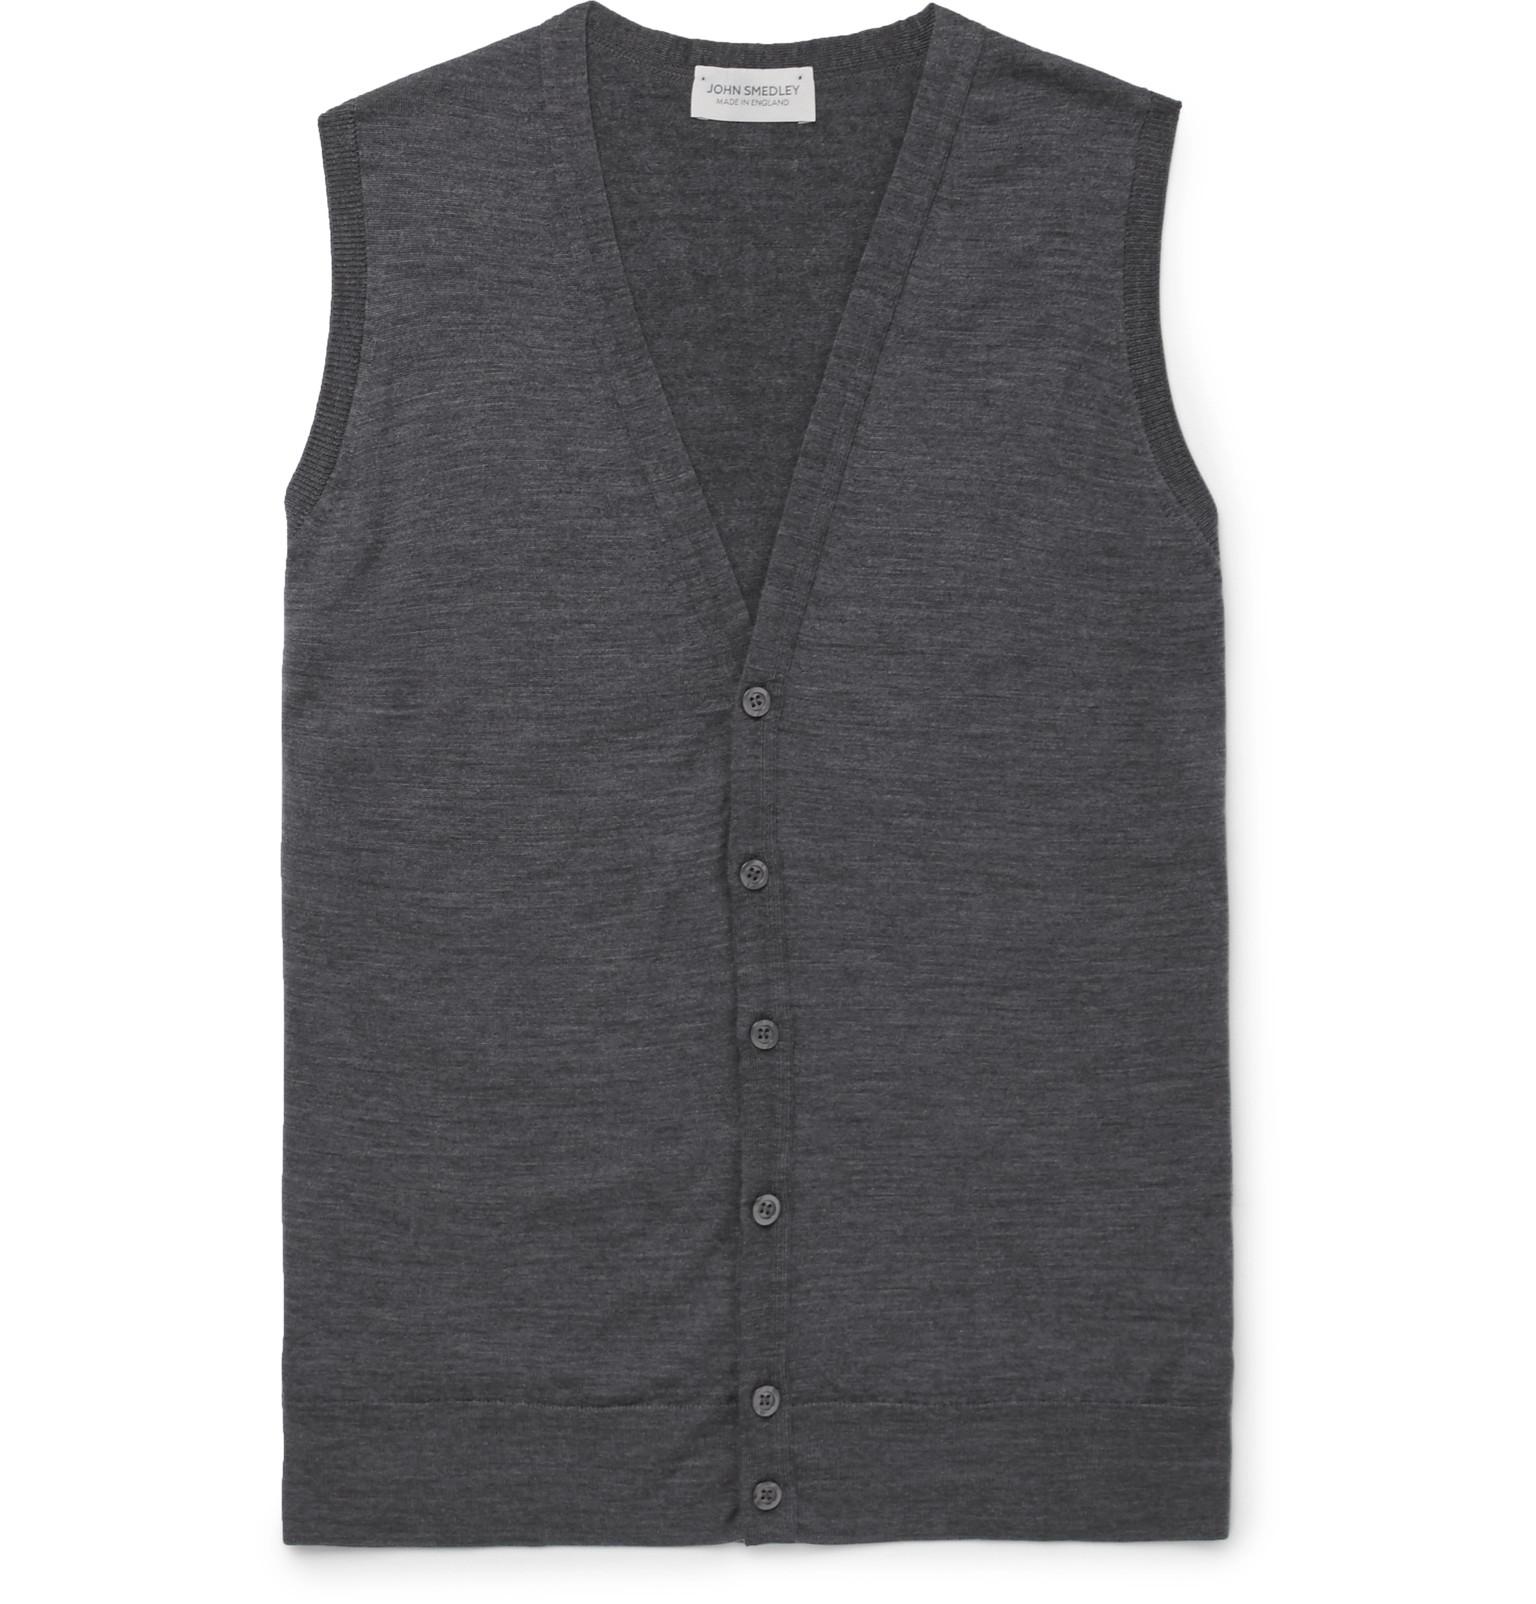 John Smedley - Huntswood Mélange Merino Wool Sweater Vest